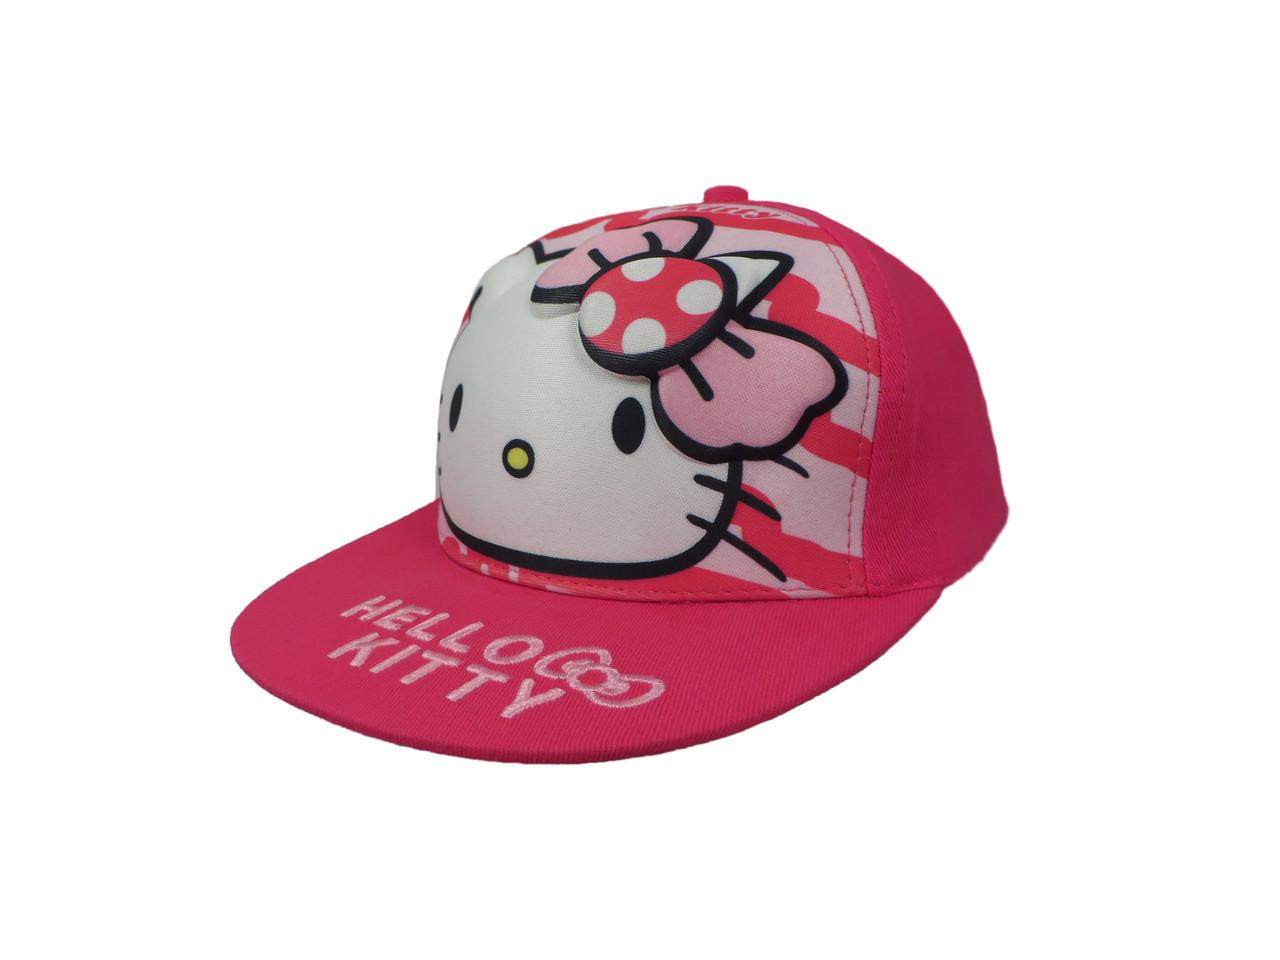 Кепка розовая Hello kitty